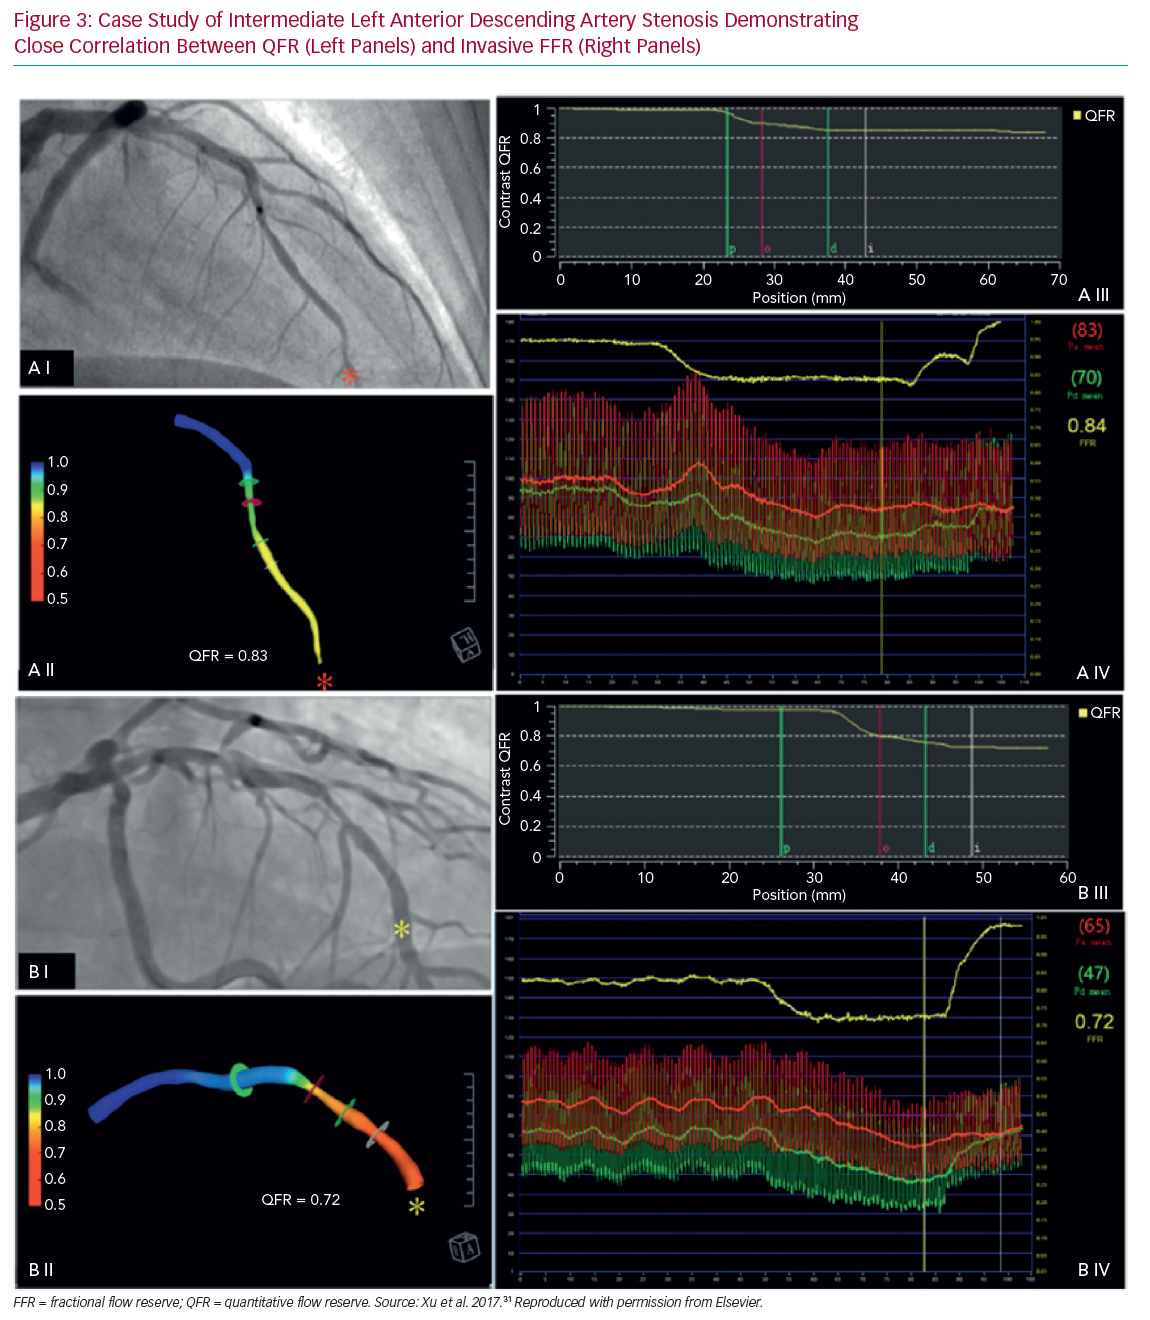 Case Study of Intermediate Left Anterior Descending